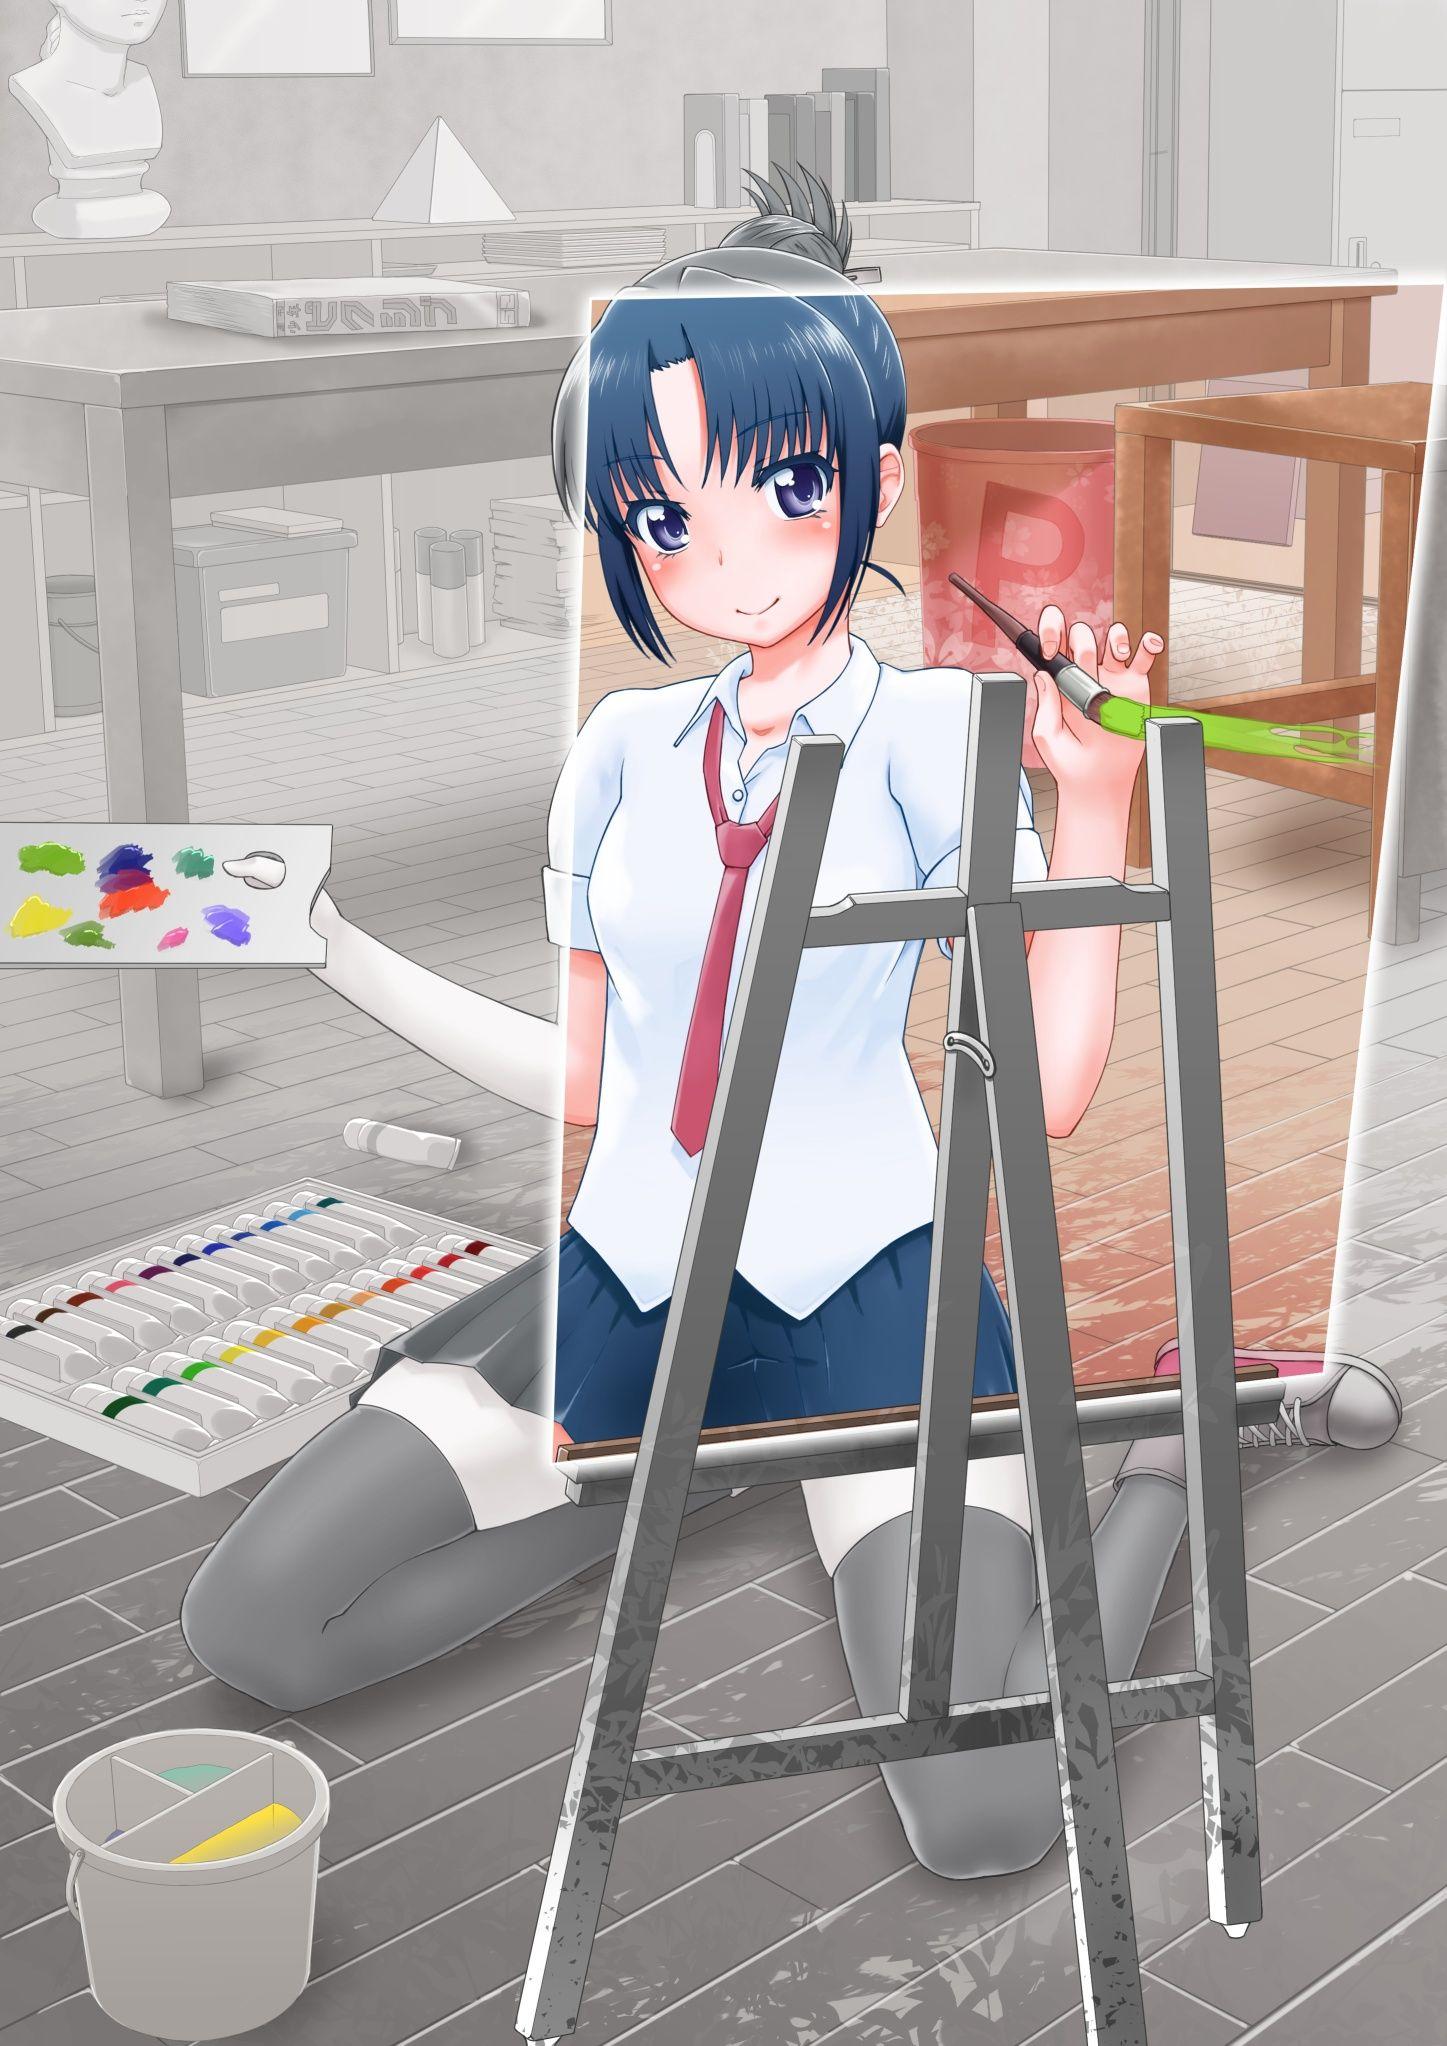 Pin on Pretty anime style pics